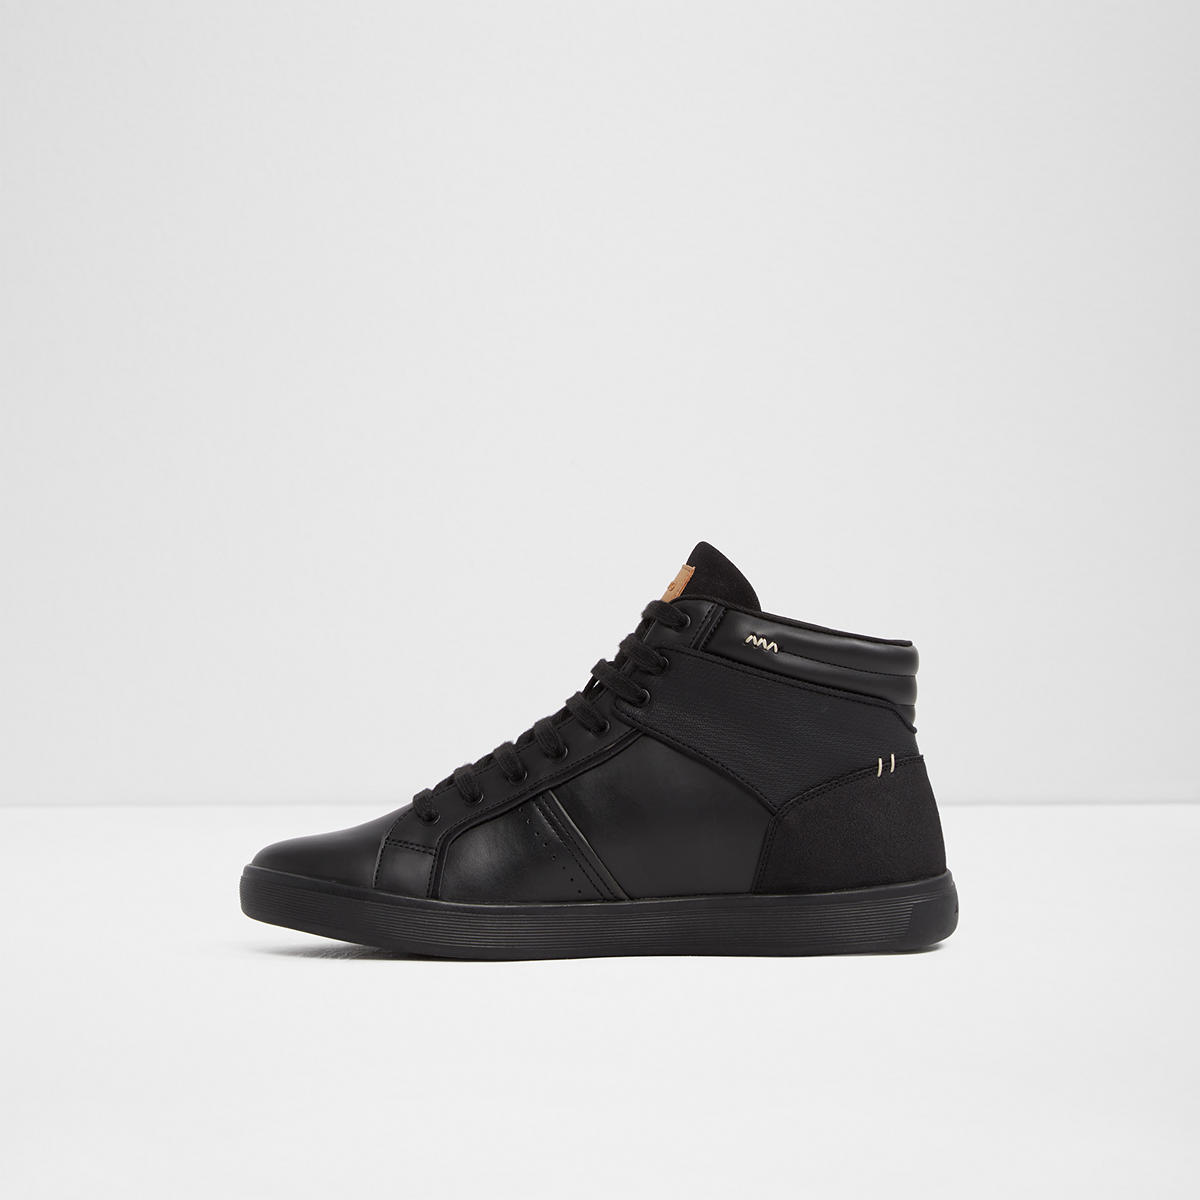 Sneakers Sneakers Men's Black US Midnight Trearia CqtEw57x